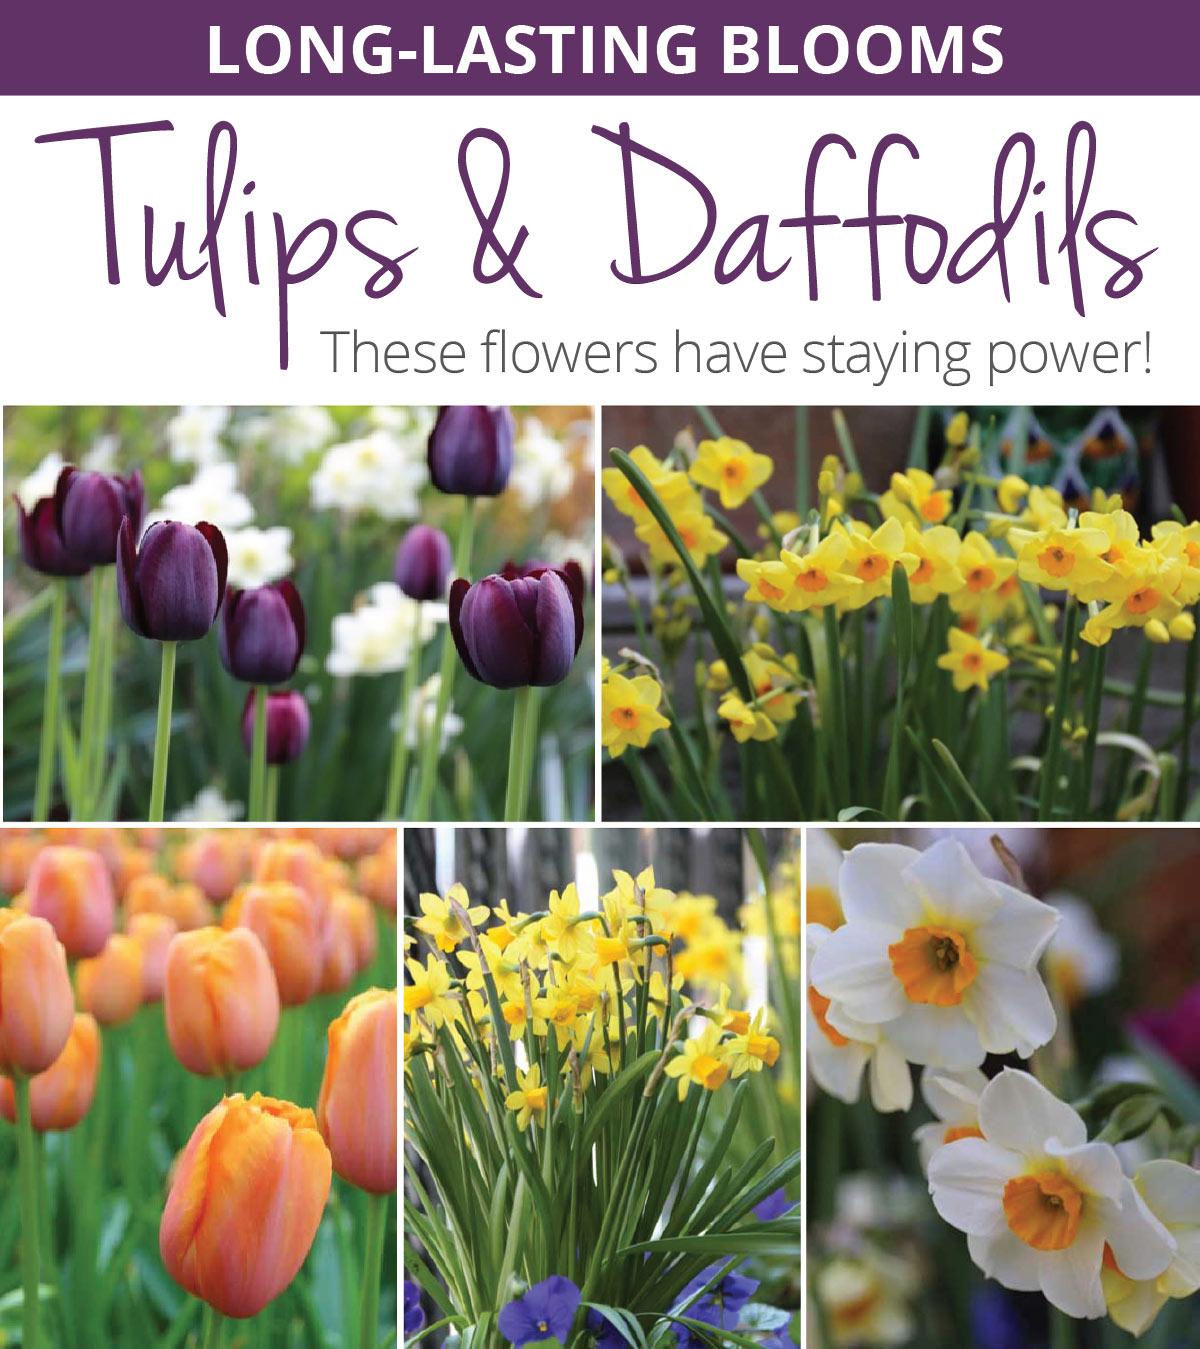 Long-Lasting-Tulips-and-Daffodils.jpg